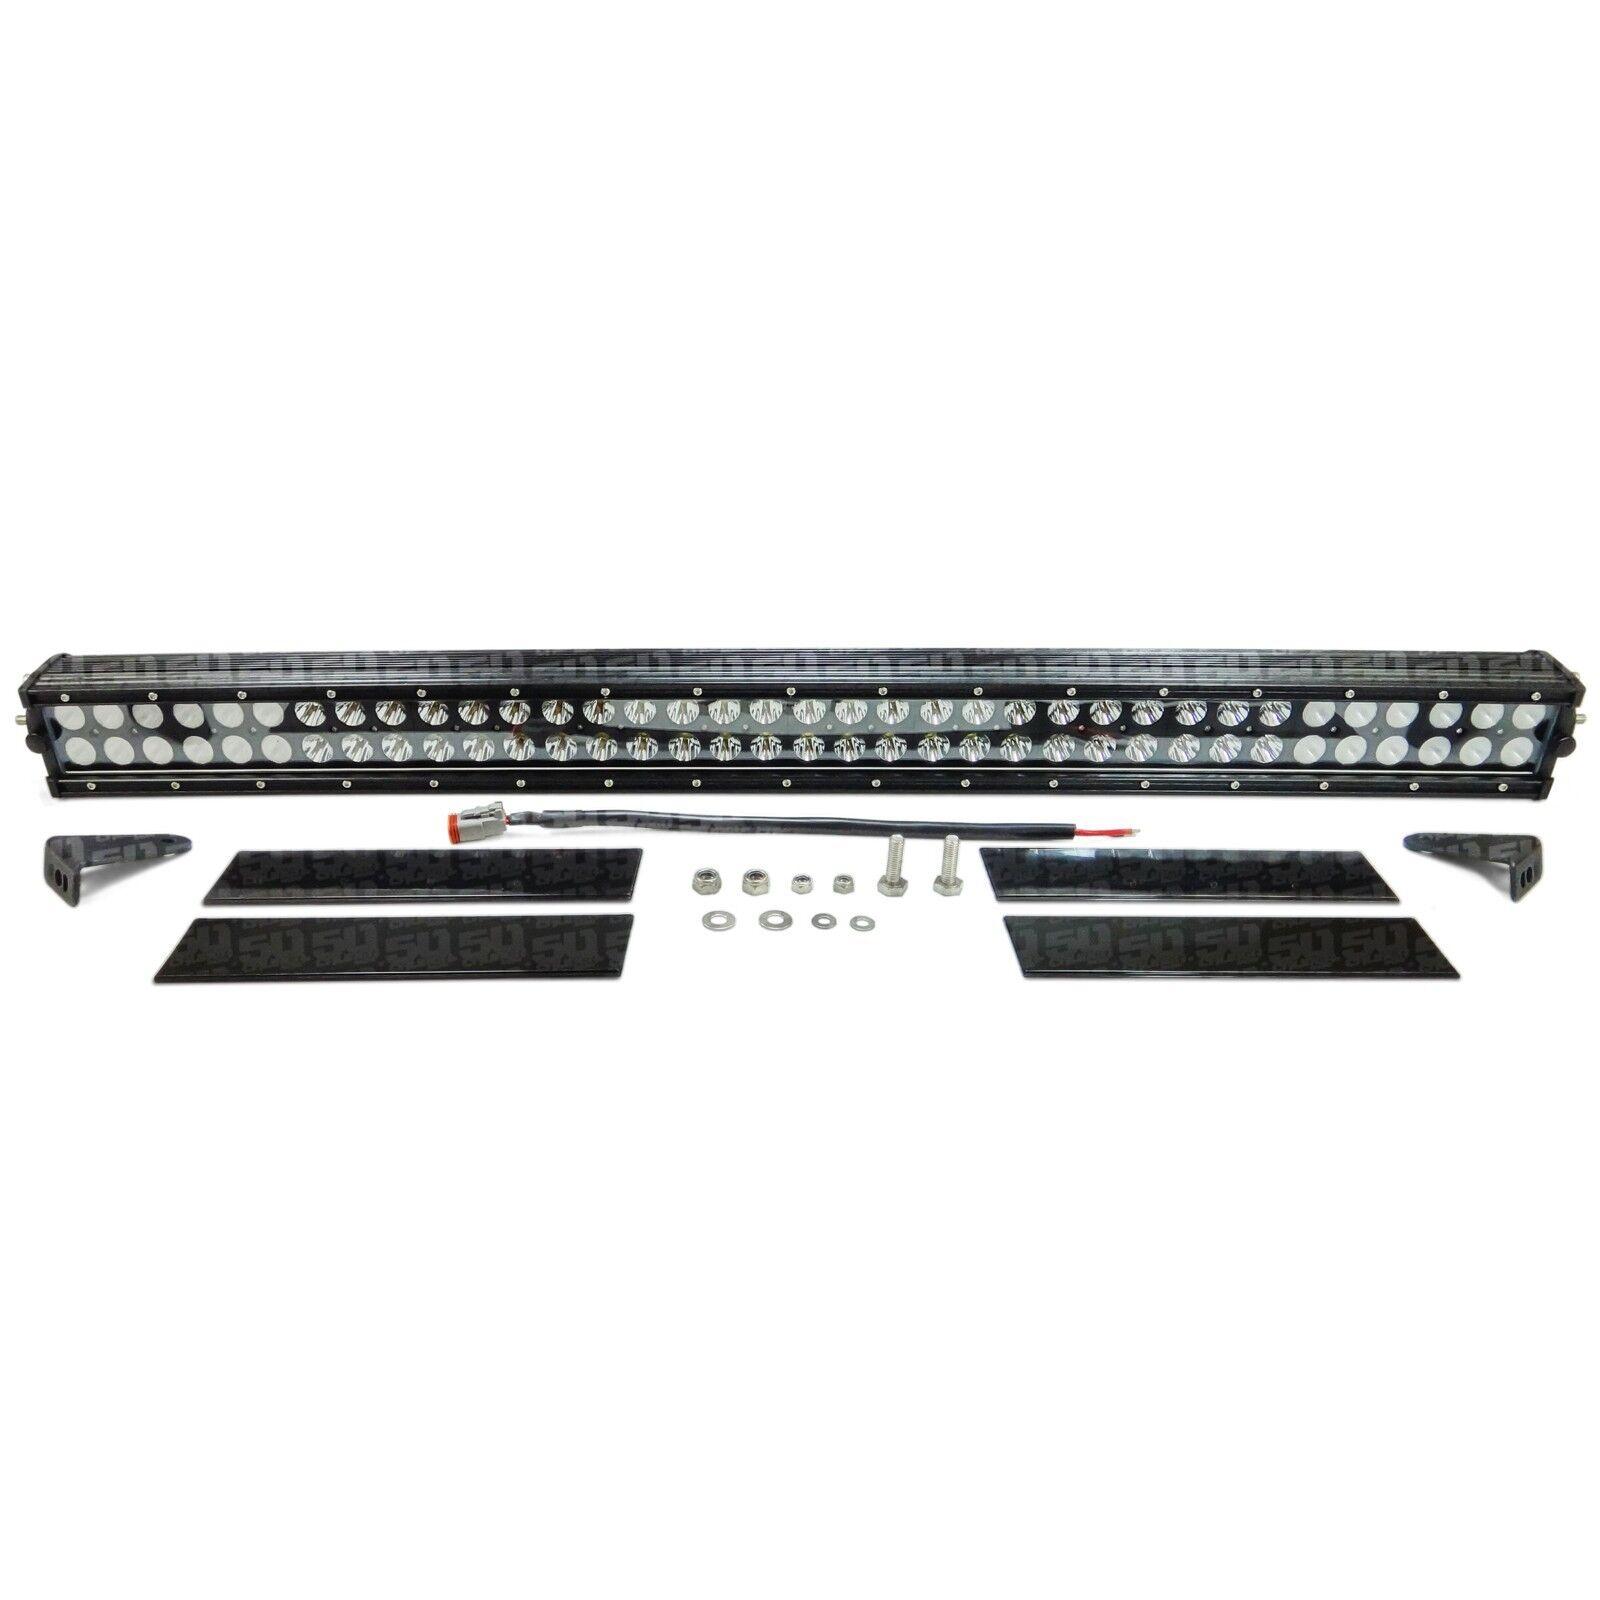 "Elite Series 50 Caliber Racing 34"" Spot LED Light Bar Adjustable Mount Bracket"